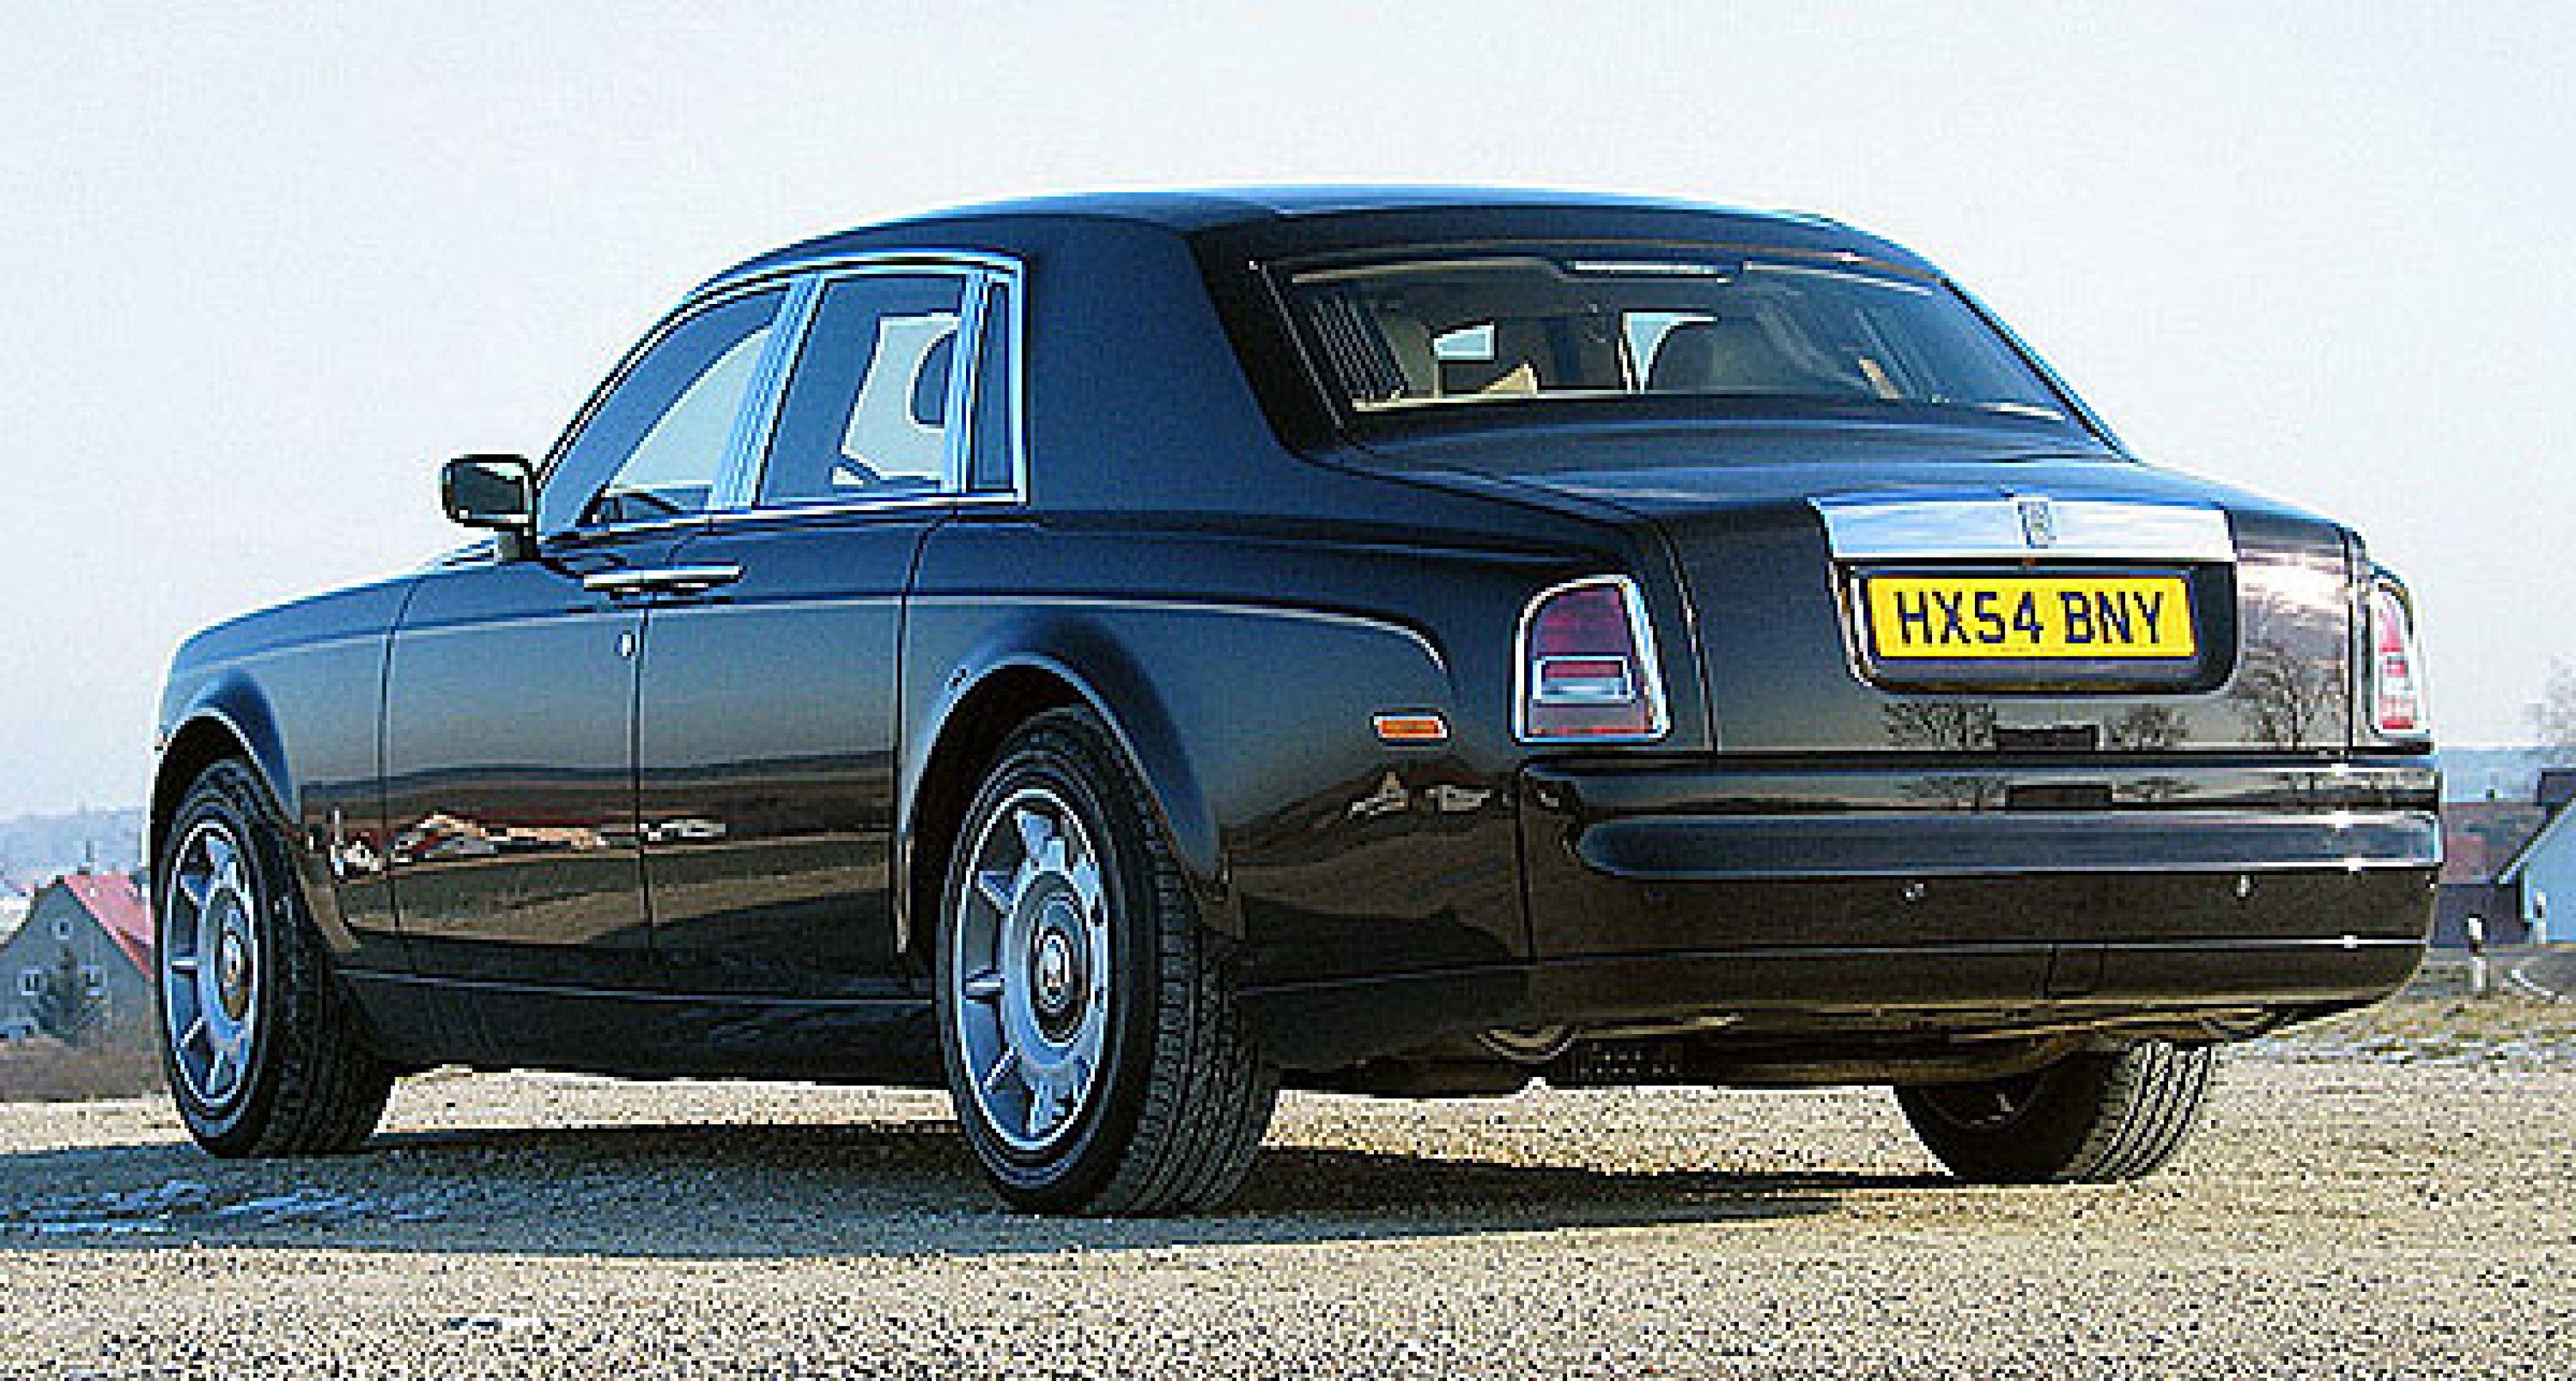 Photographic studies of the design of the new Rolls-Royce Phantom